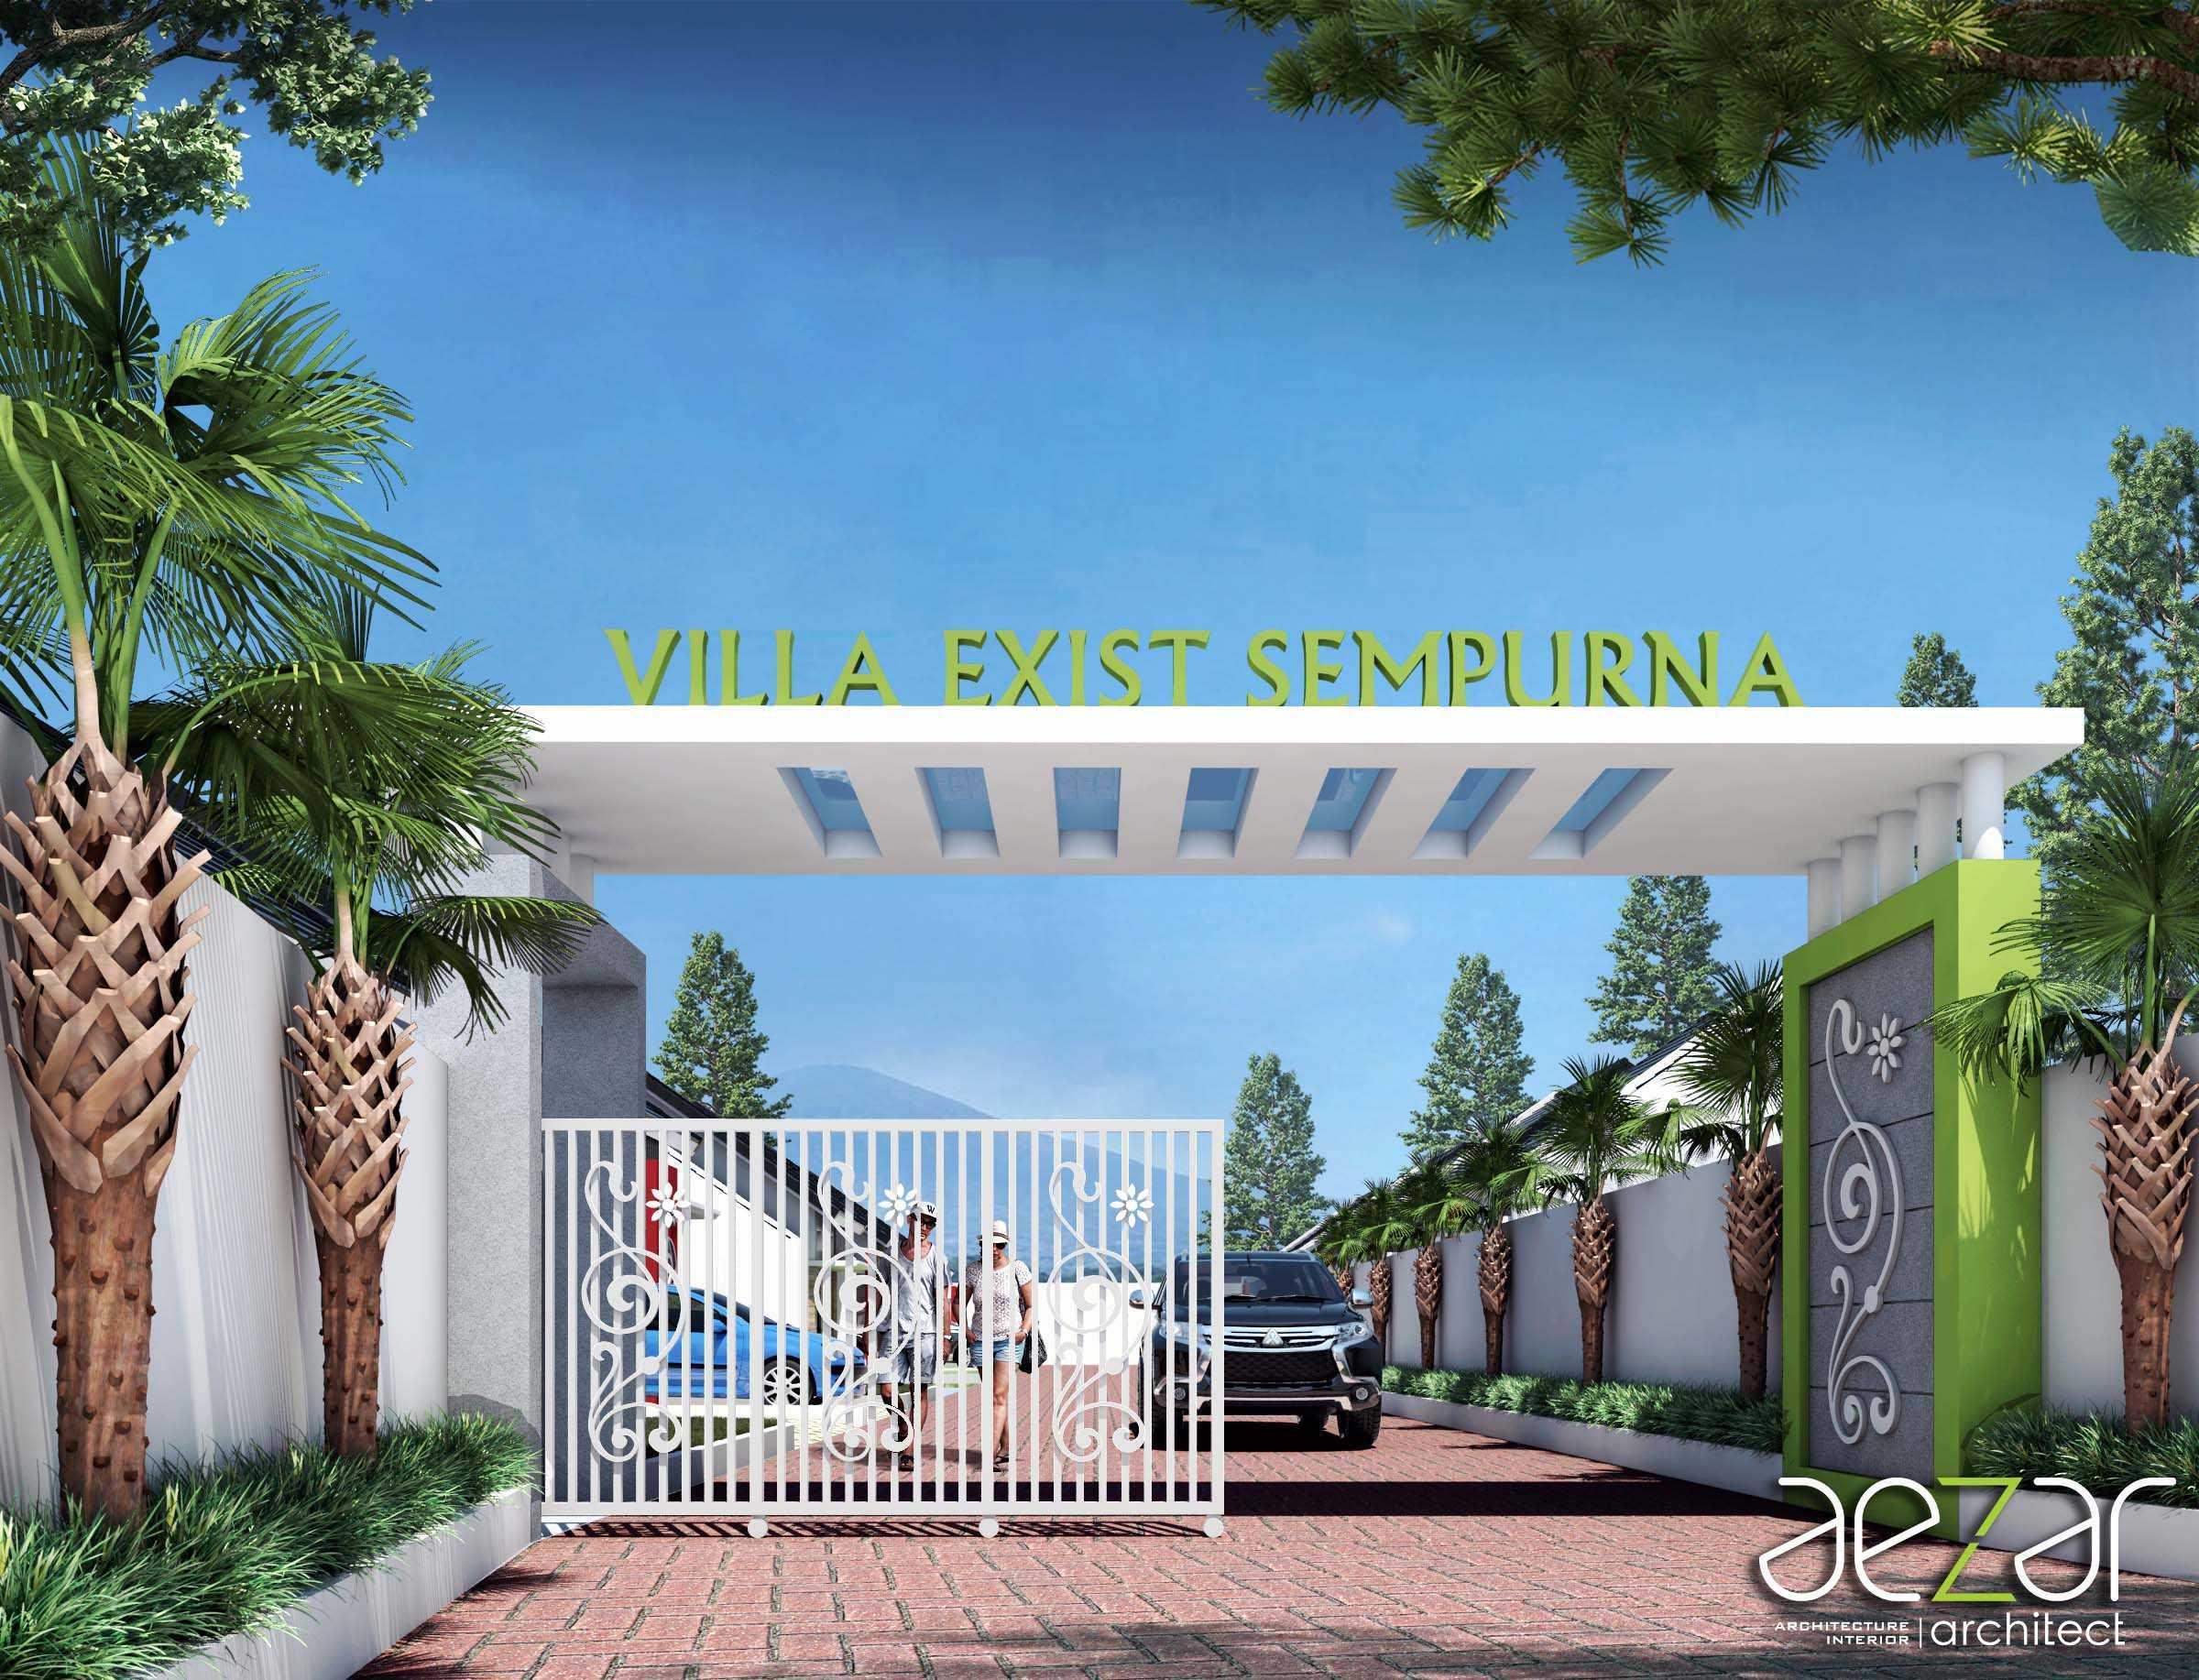 Aezar Architect Perumahan Villa Exist Sempurna Kabupaten Batang, Jawa Tengah, Indonesia Kabupaten Batang, Jawa Tengah, Indonesia Entrance Area Minimalist  54481